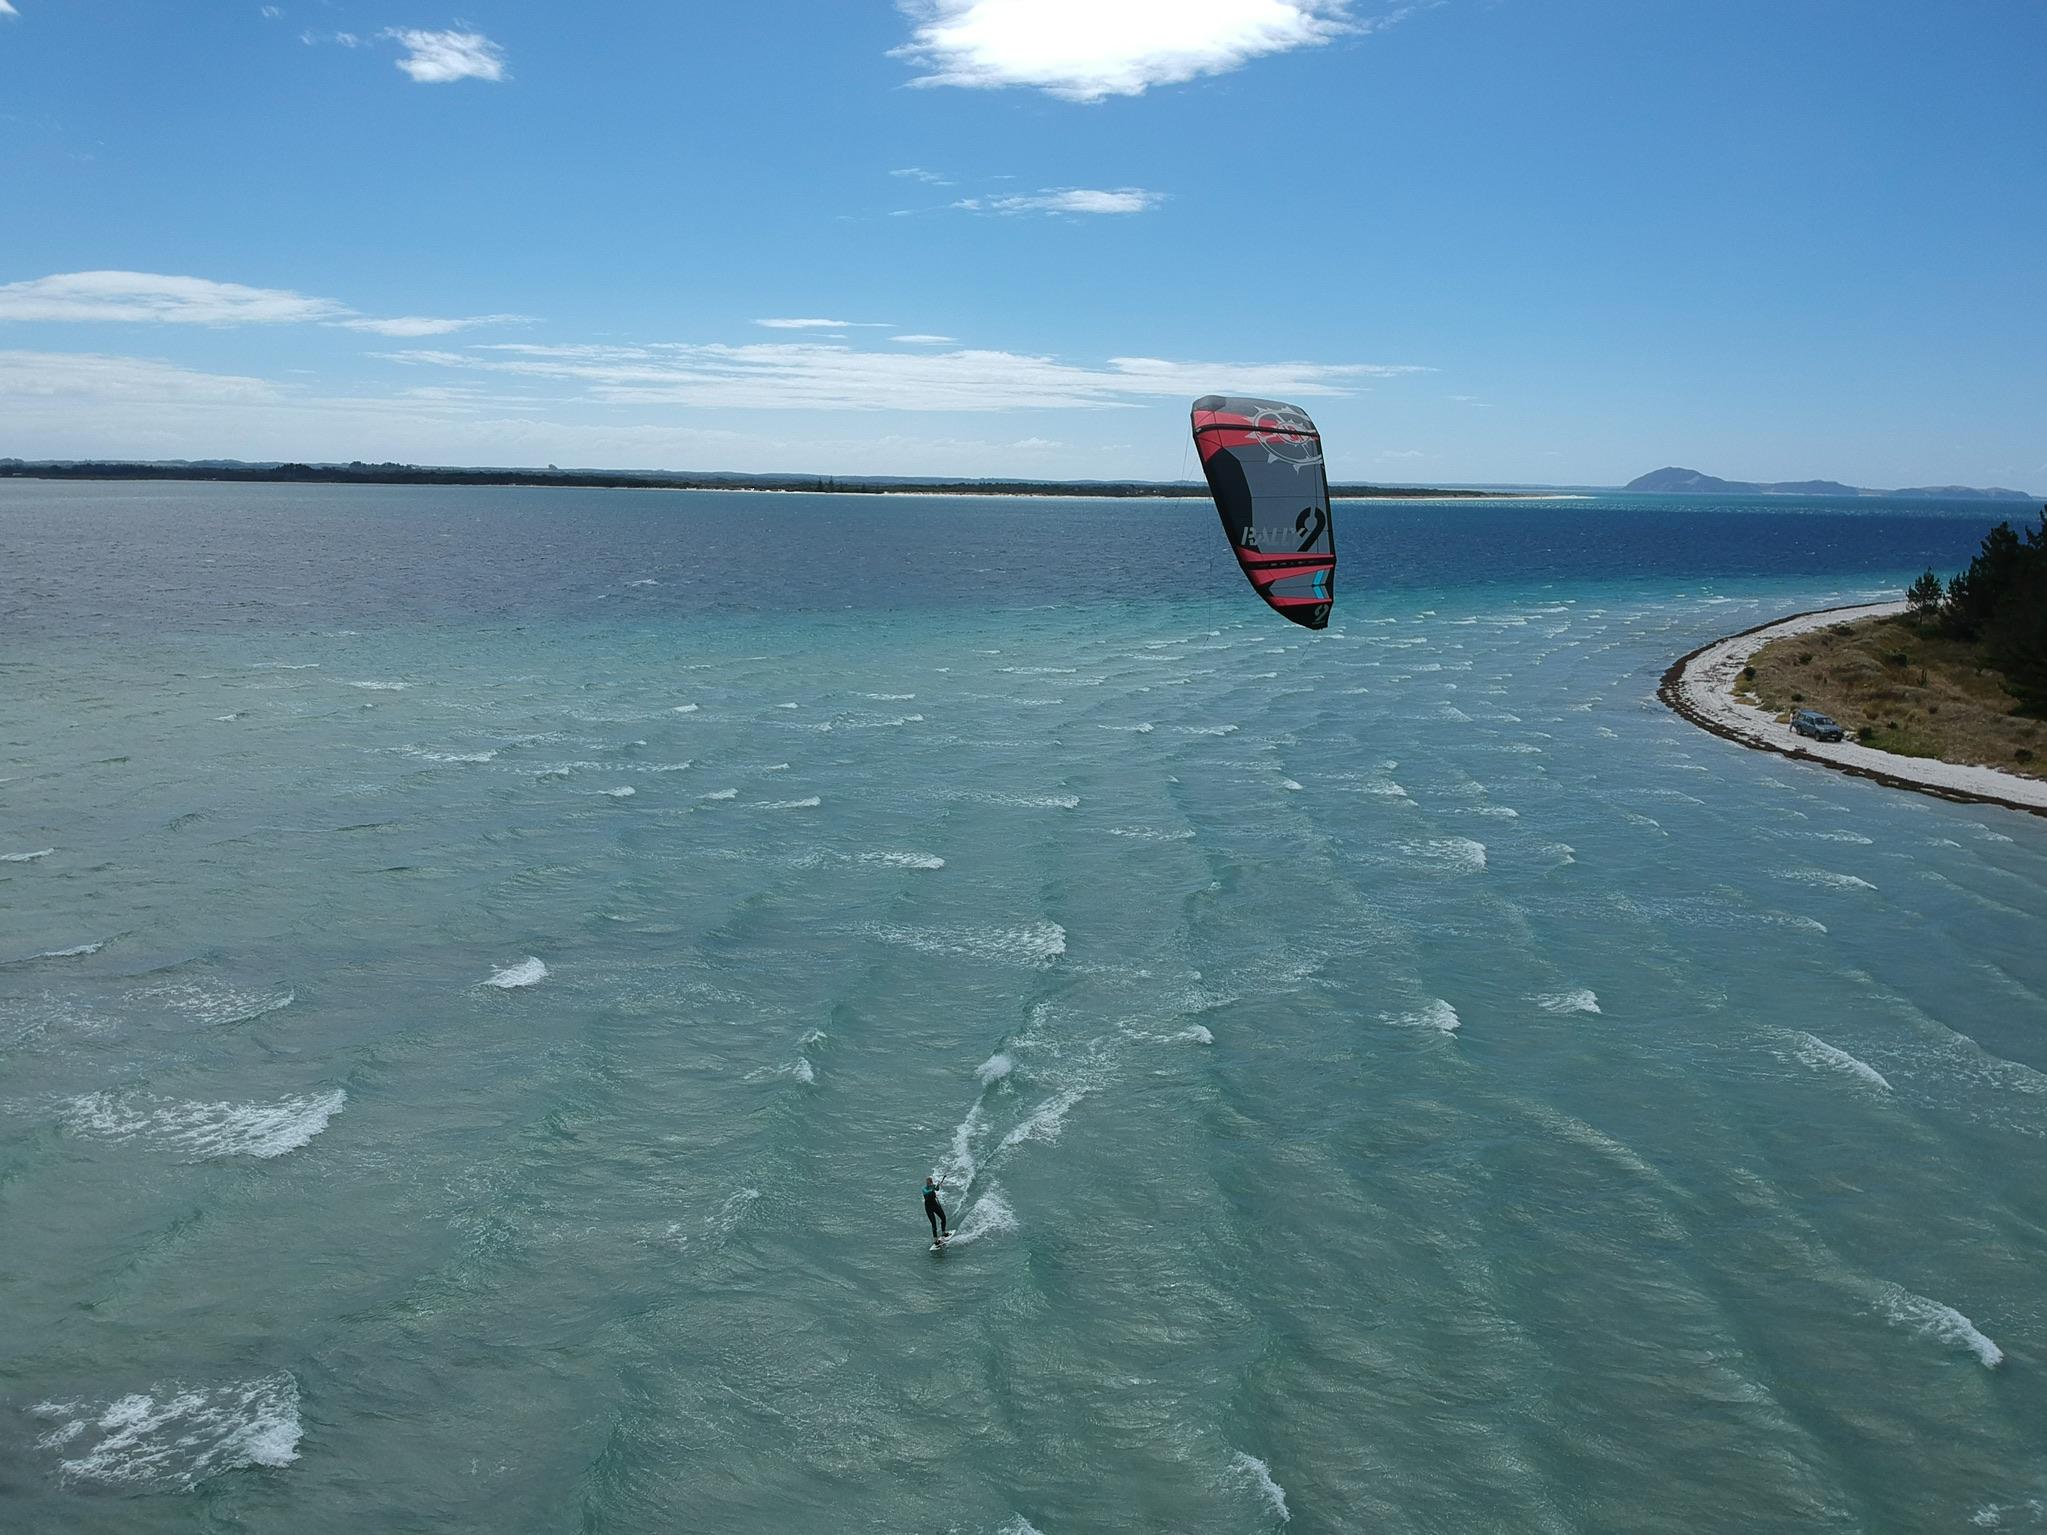 Kitesurfing on Rangiputa Harbour